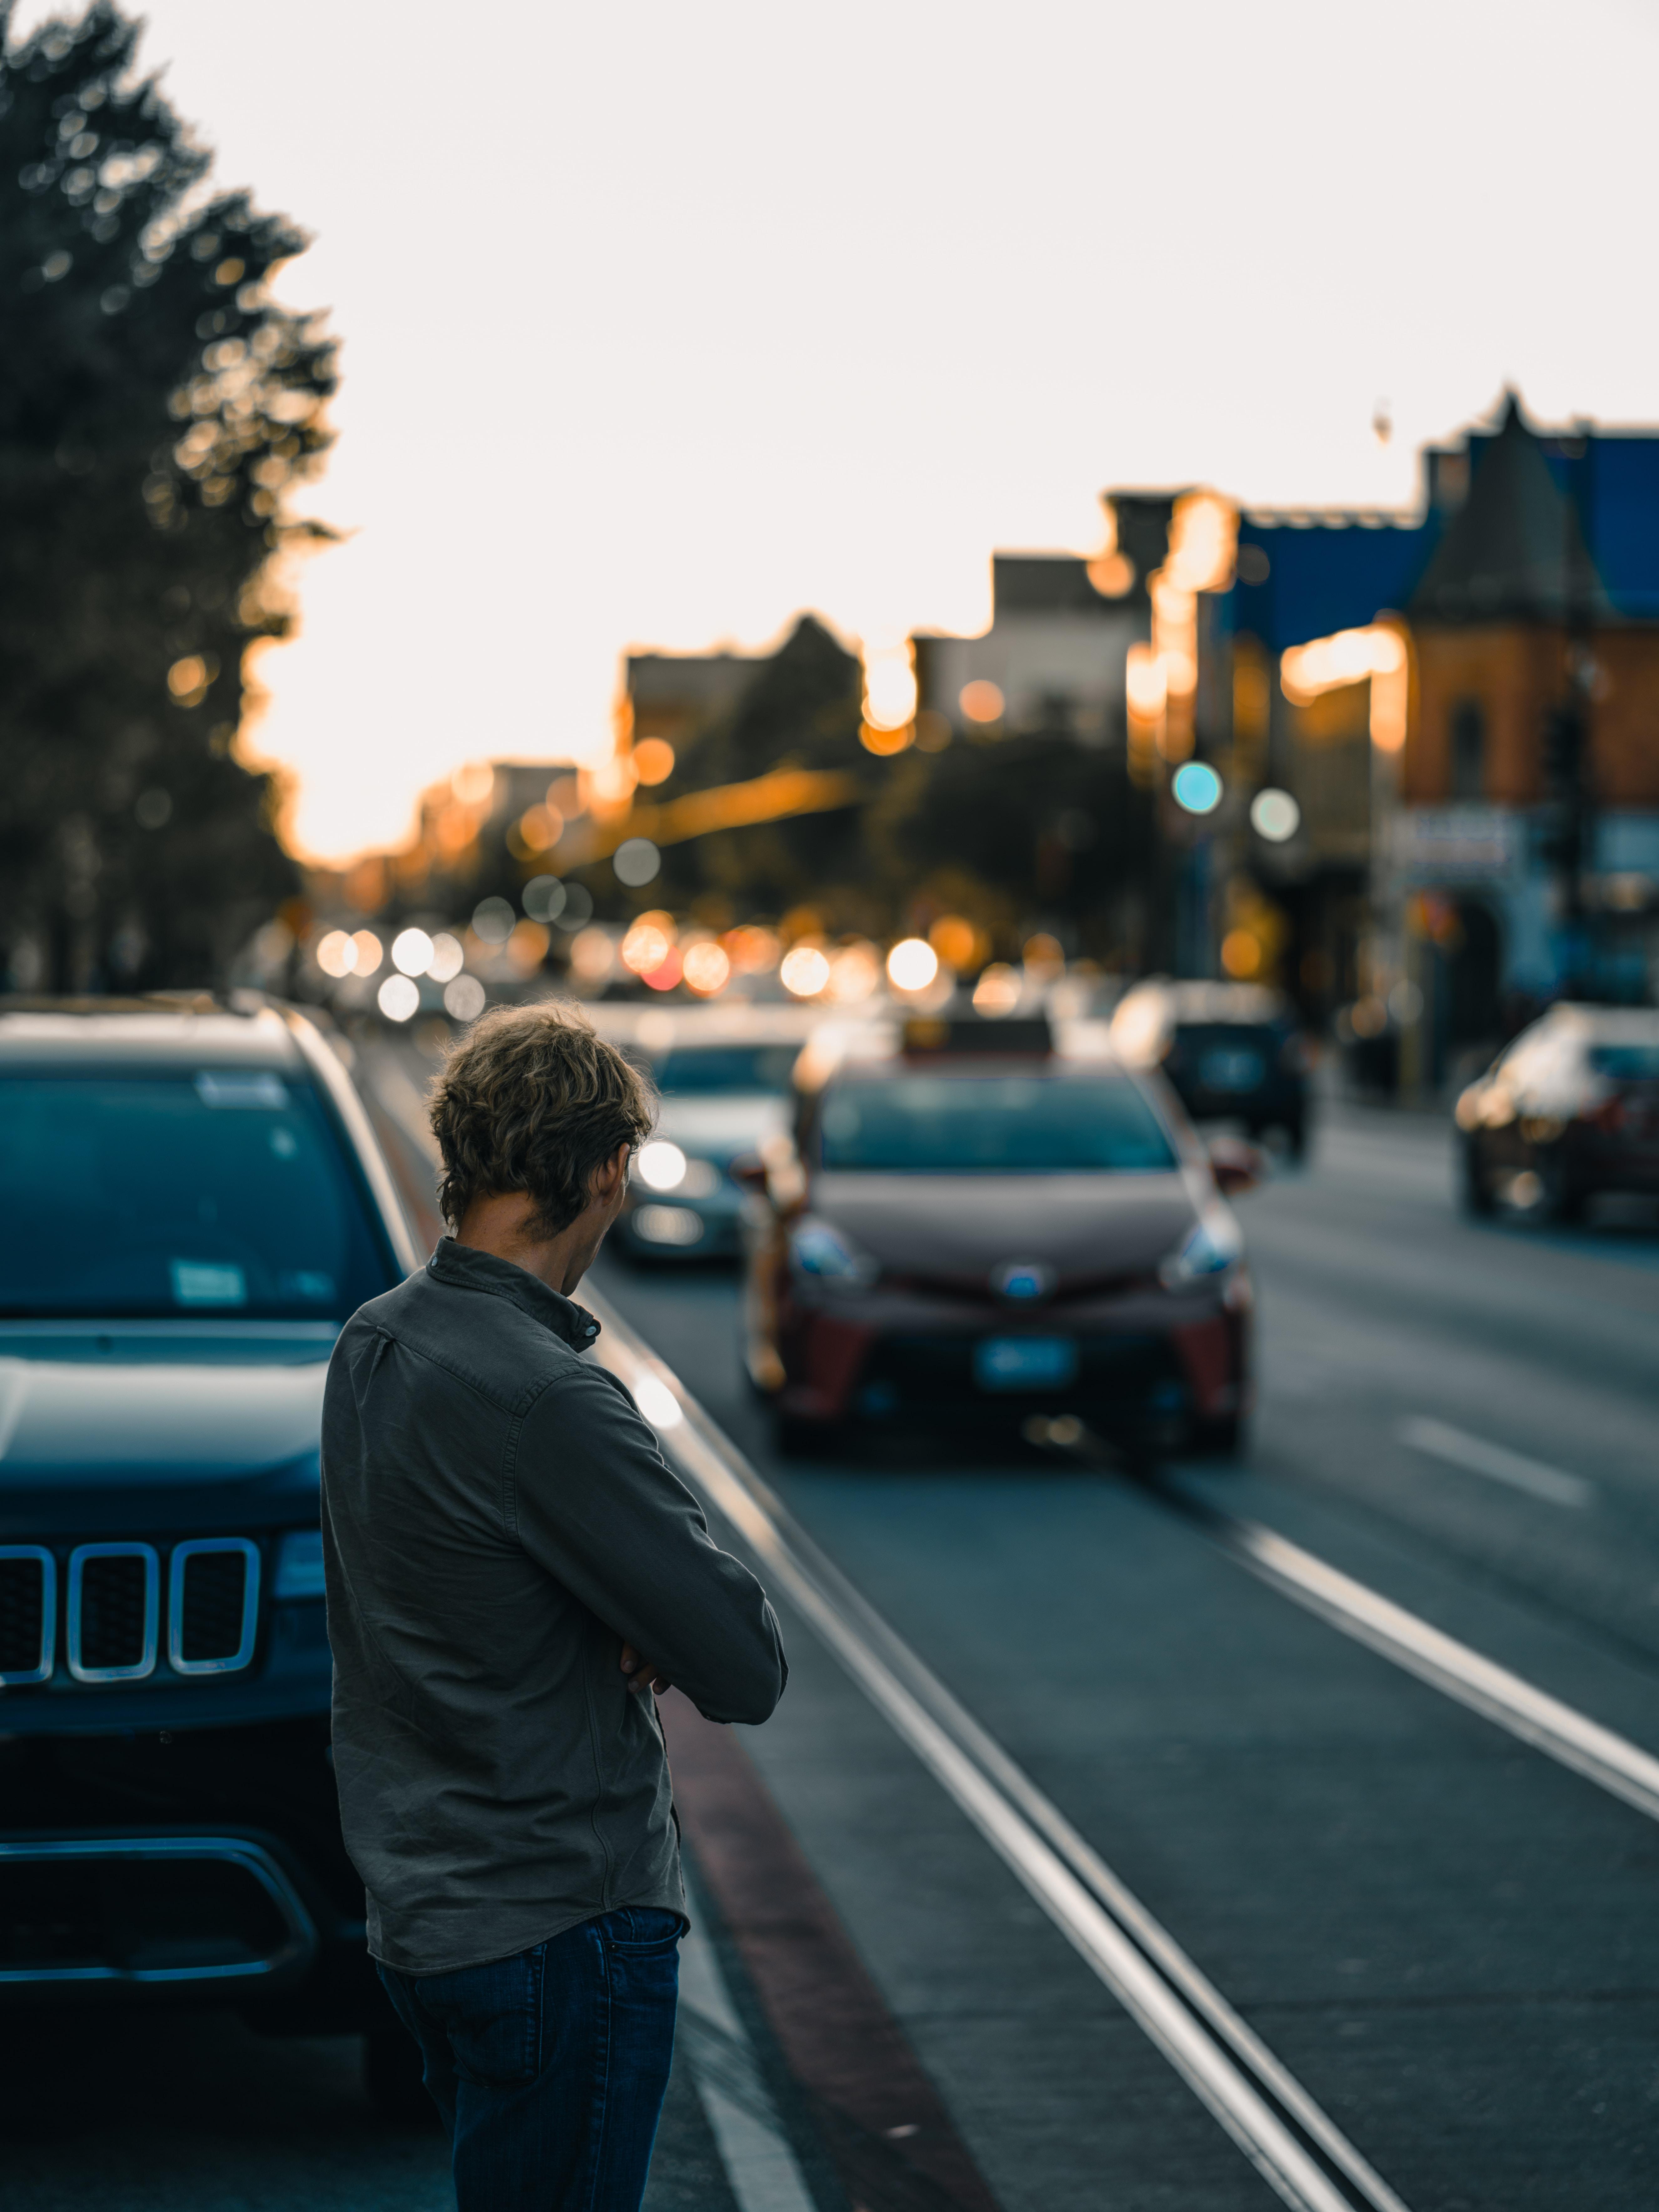 man standing near vehicle